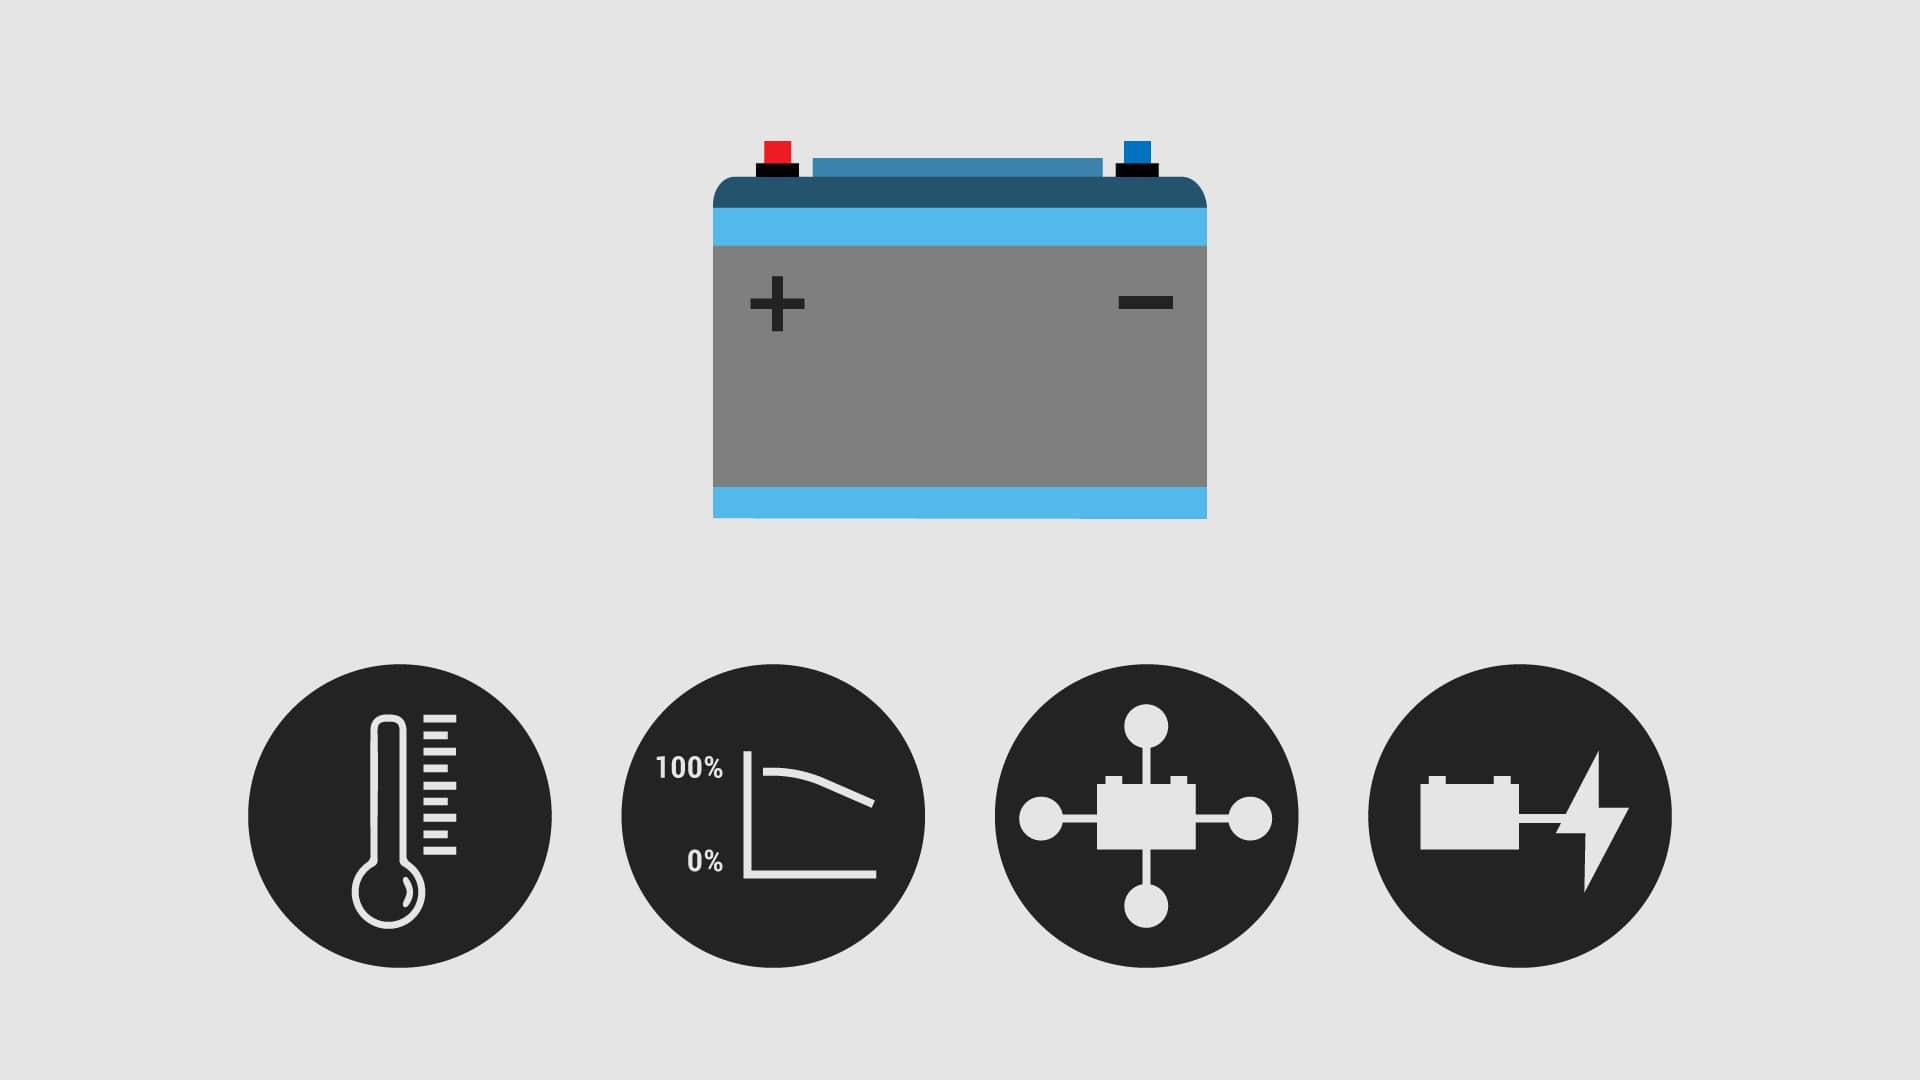 Campervan Leisure Battery performance